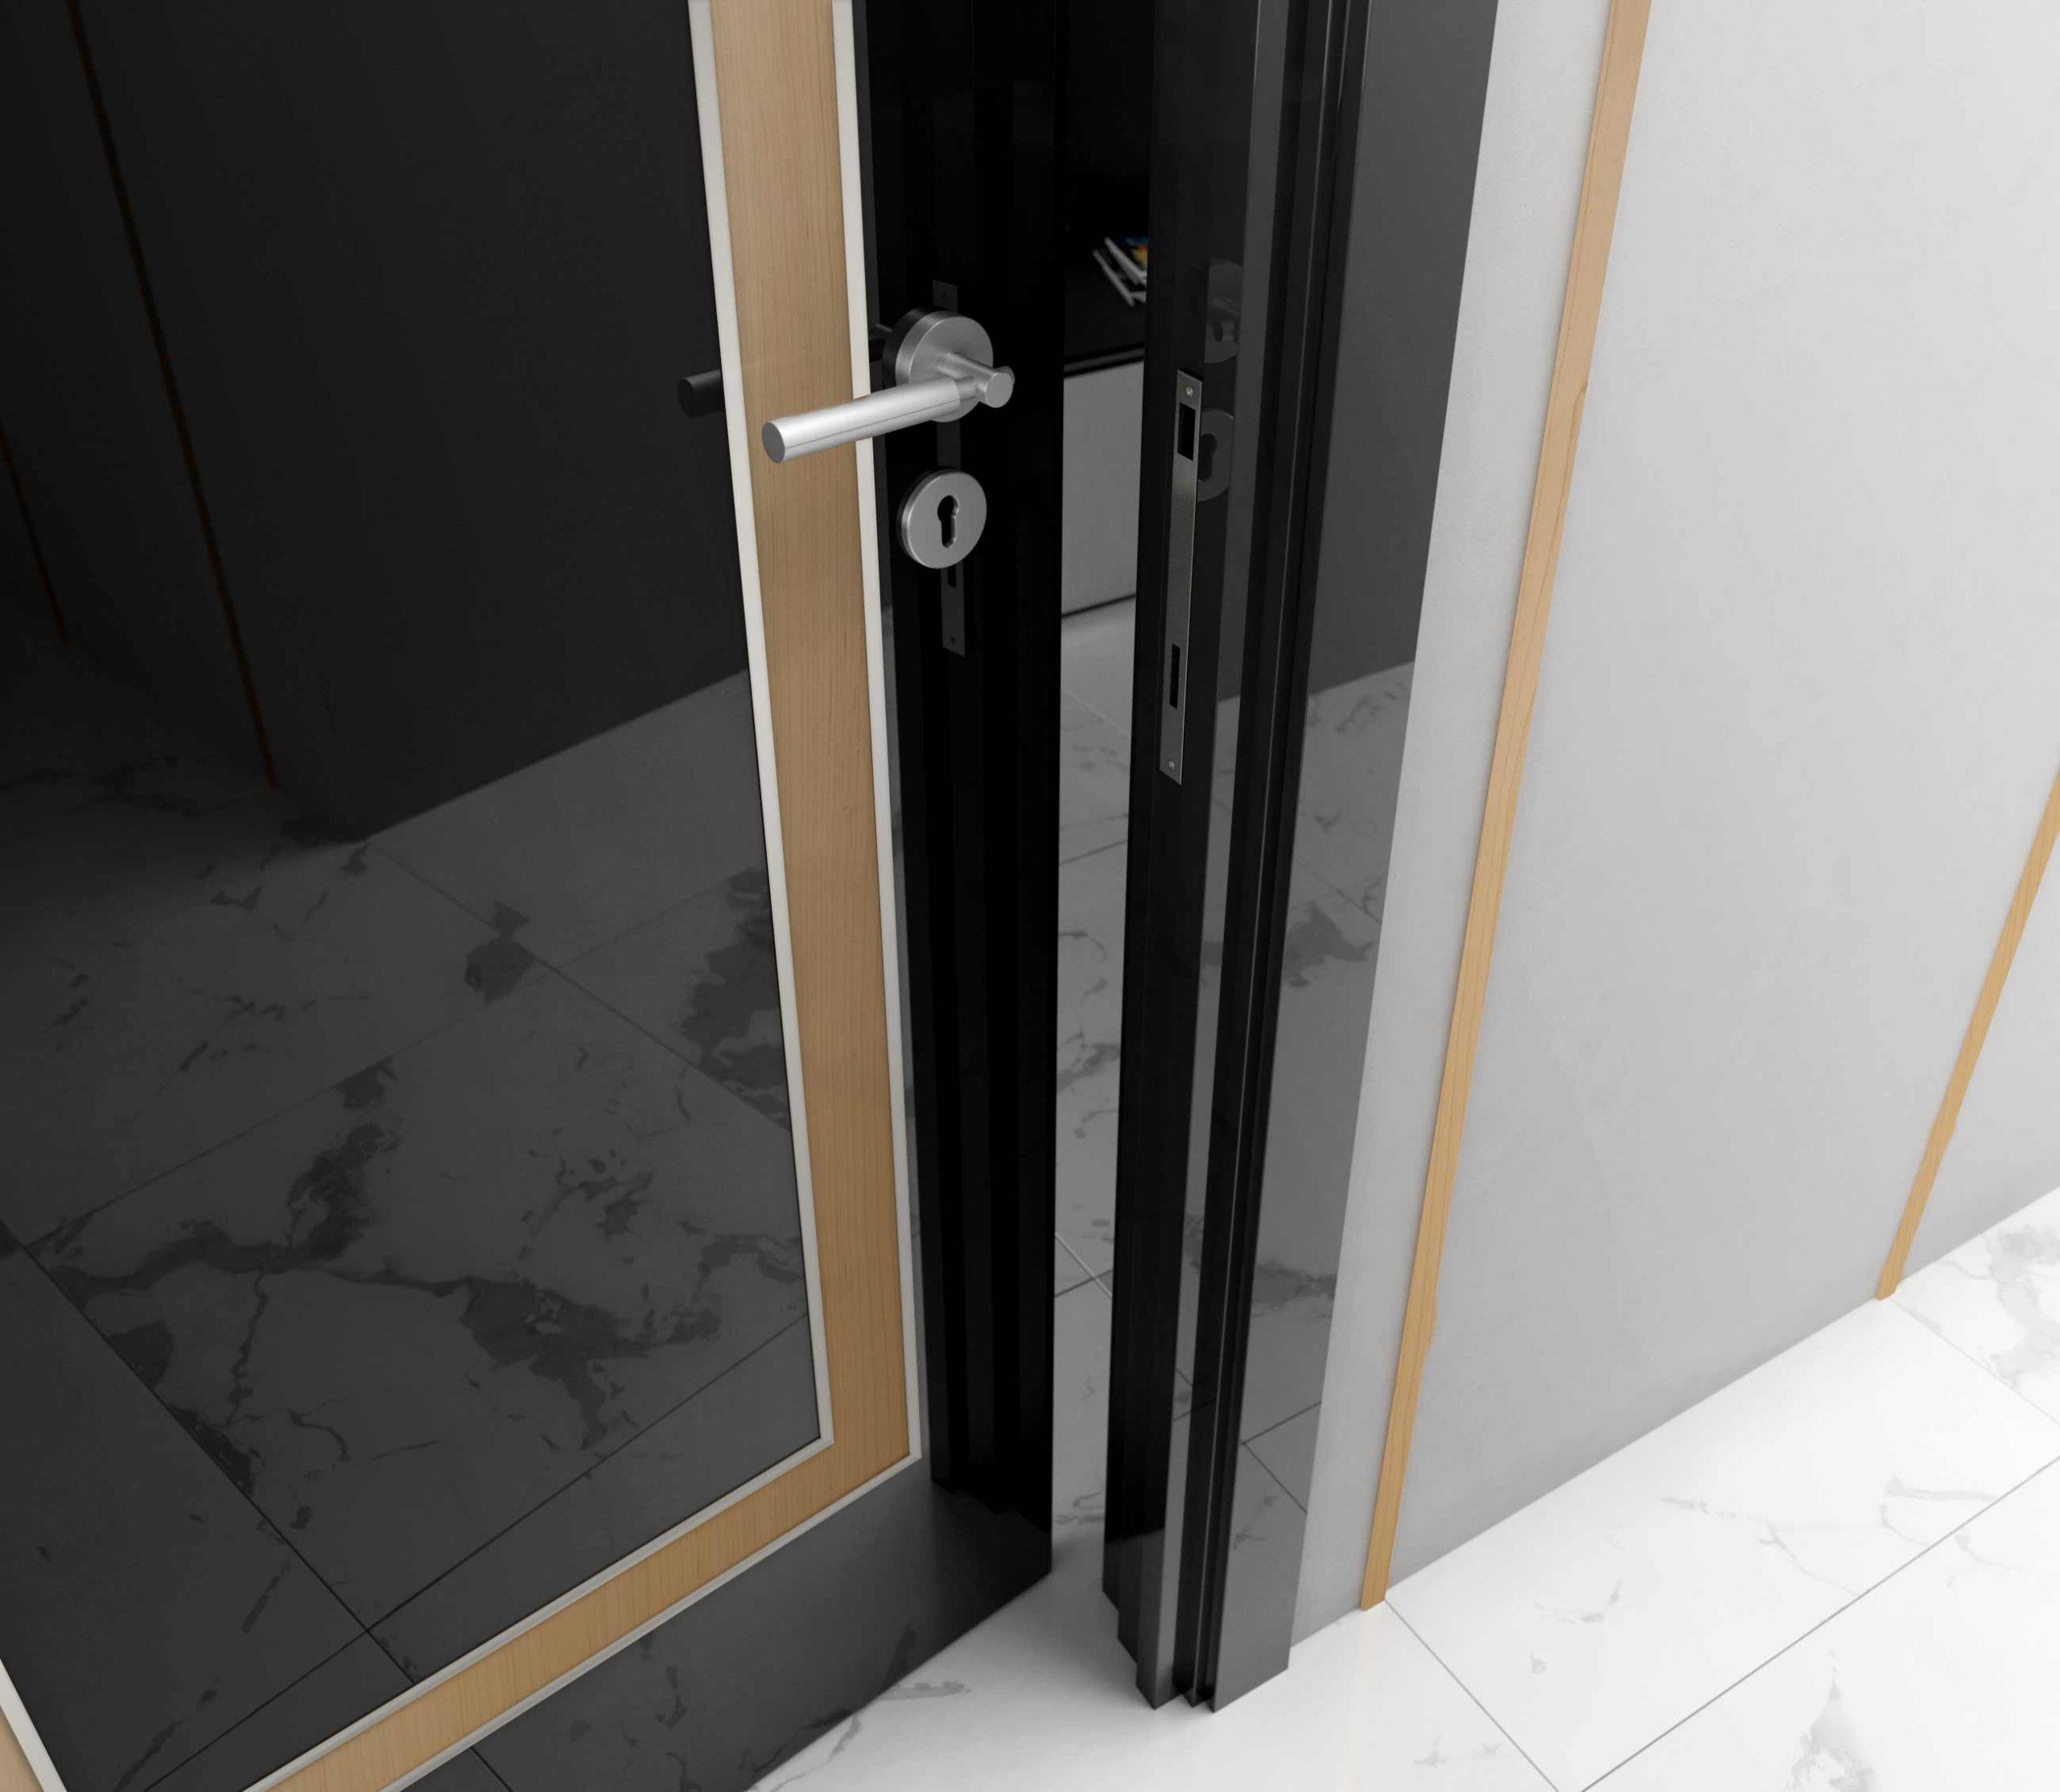 porta-config-preto-alto-brilho-faixa-betula-embutido-inox-401